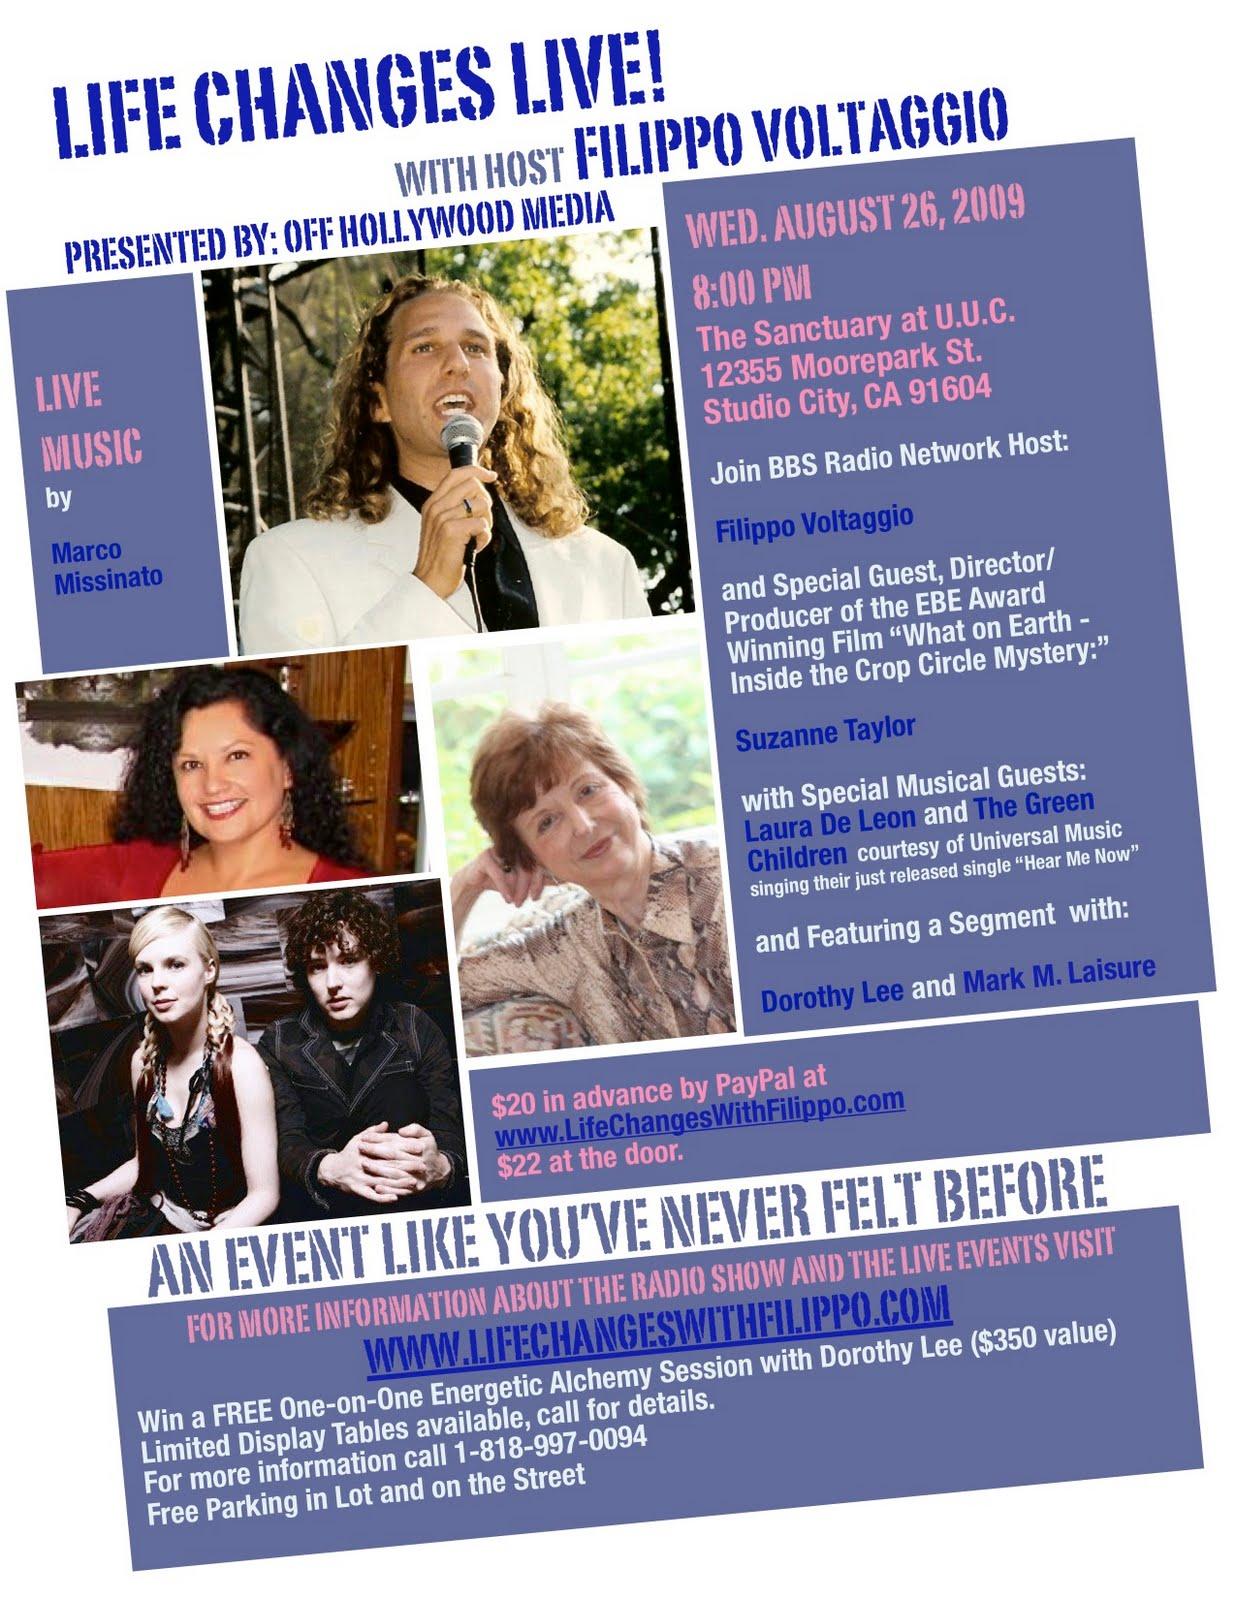 http://2.bp.blogspot.com/_HHJTpxXJMds/S-eCbbjP4QI/AAAAAAAAAIw/tWI8osc1-zA/s1600/Life+Changes+Live%21+With+Guest+Suzanne+Taylor.jpg